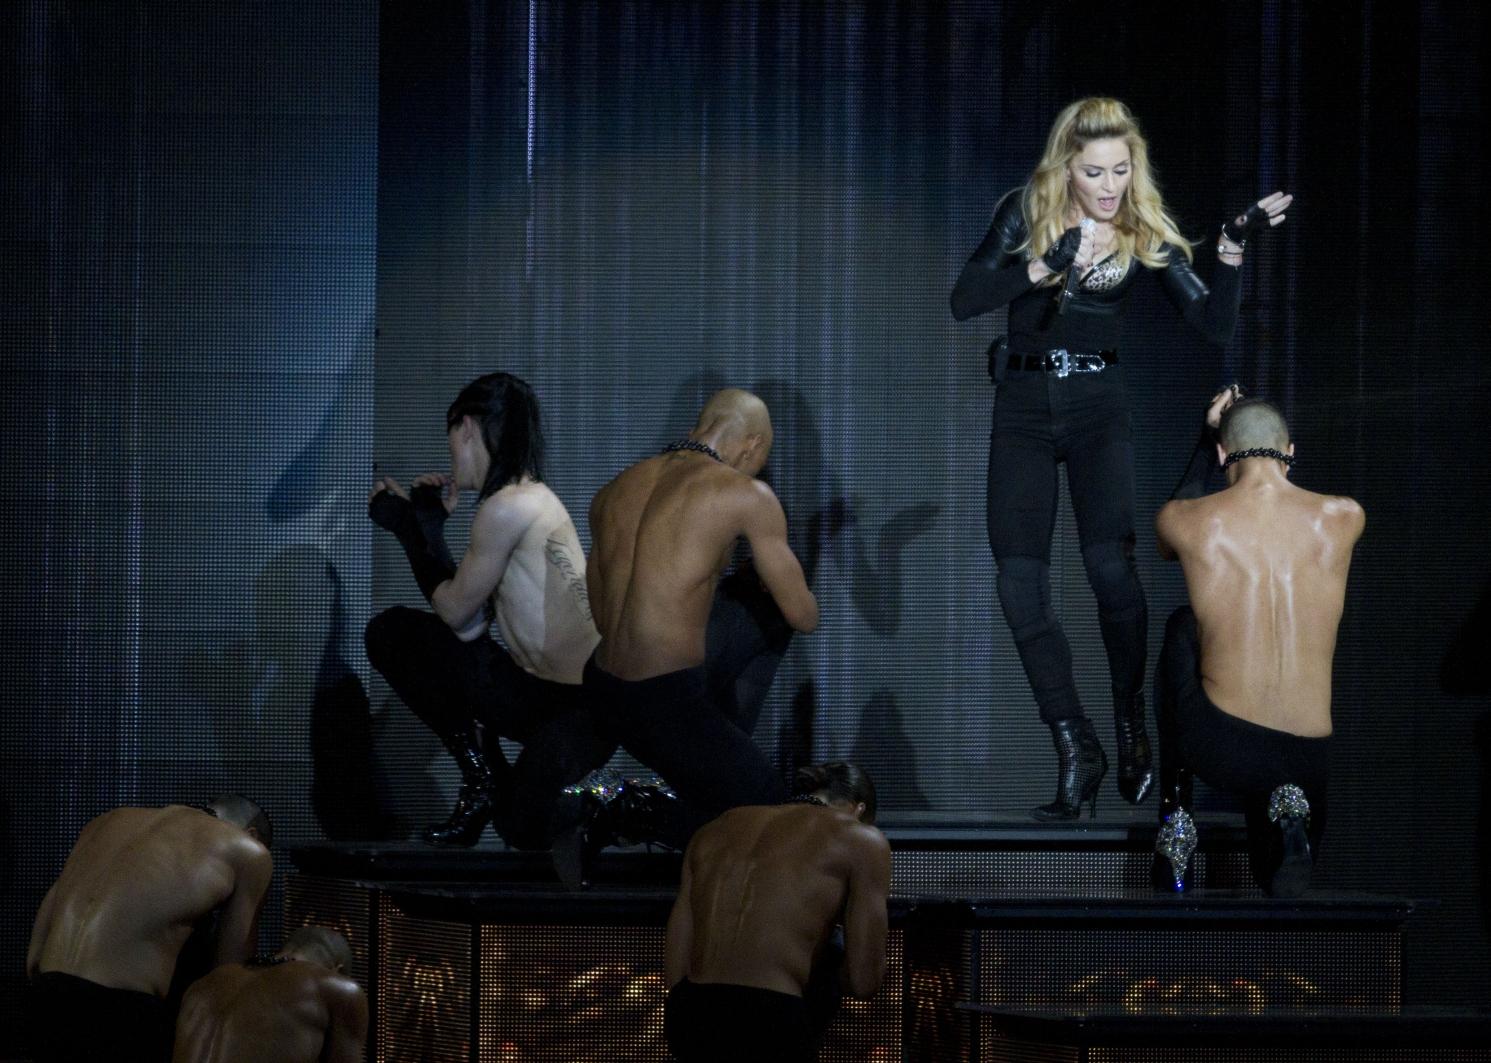 Gira >> MDNA Tour 2012 - Página 49 20120531-pictures-madonna-mdna-tour-tel-aviv-opening-10